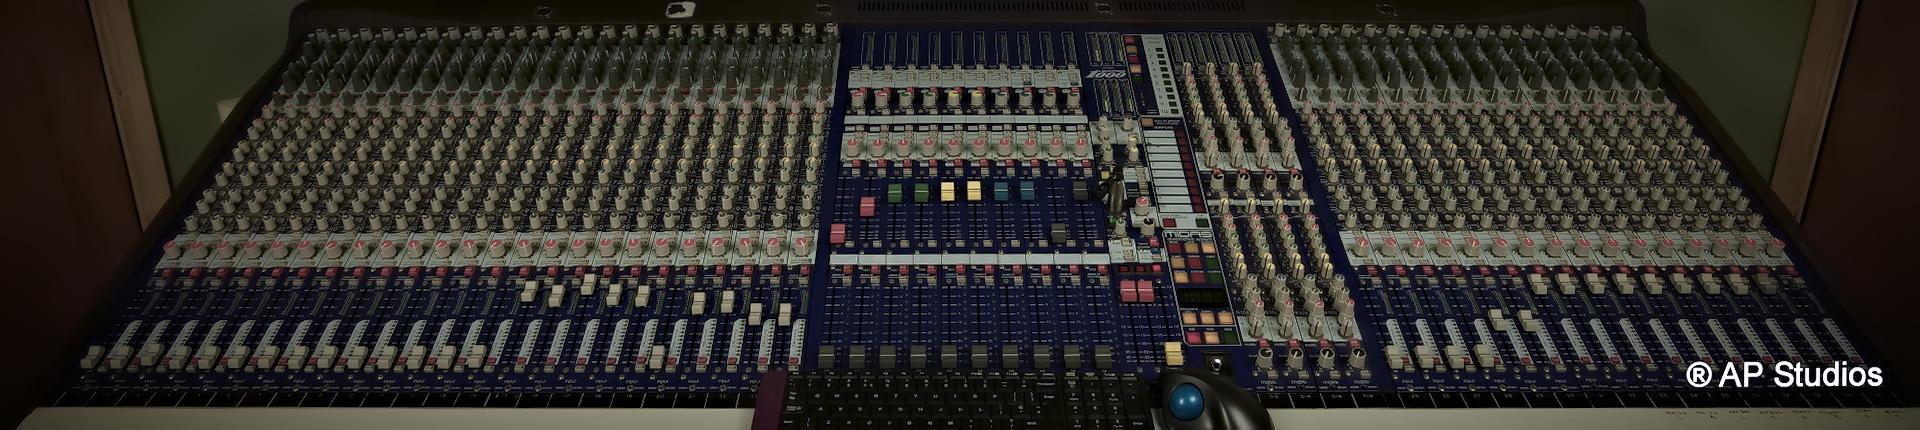 AP Recording Studios Dublin Midas Heritage 1000 Desk